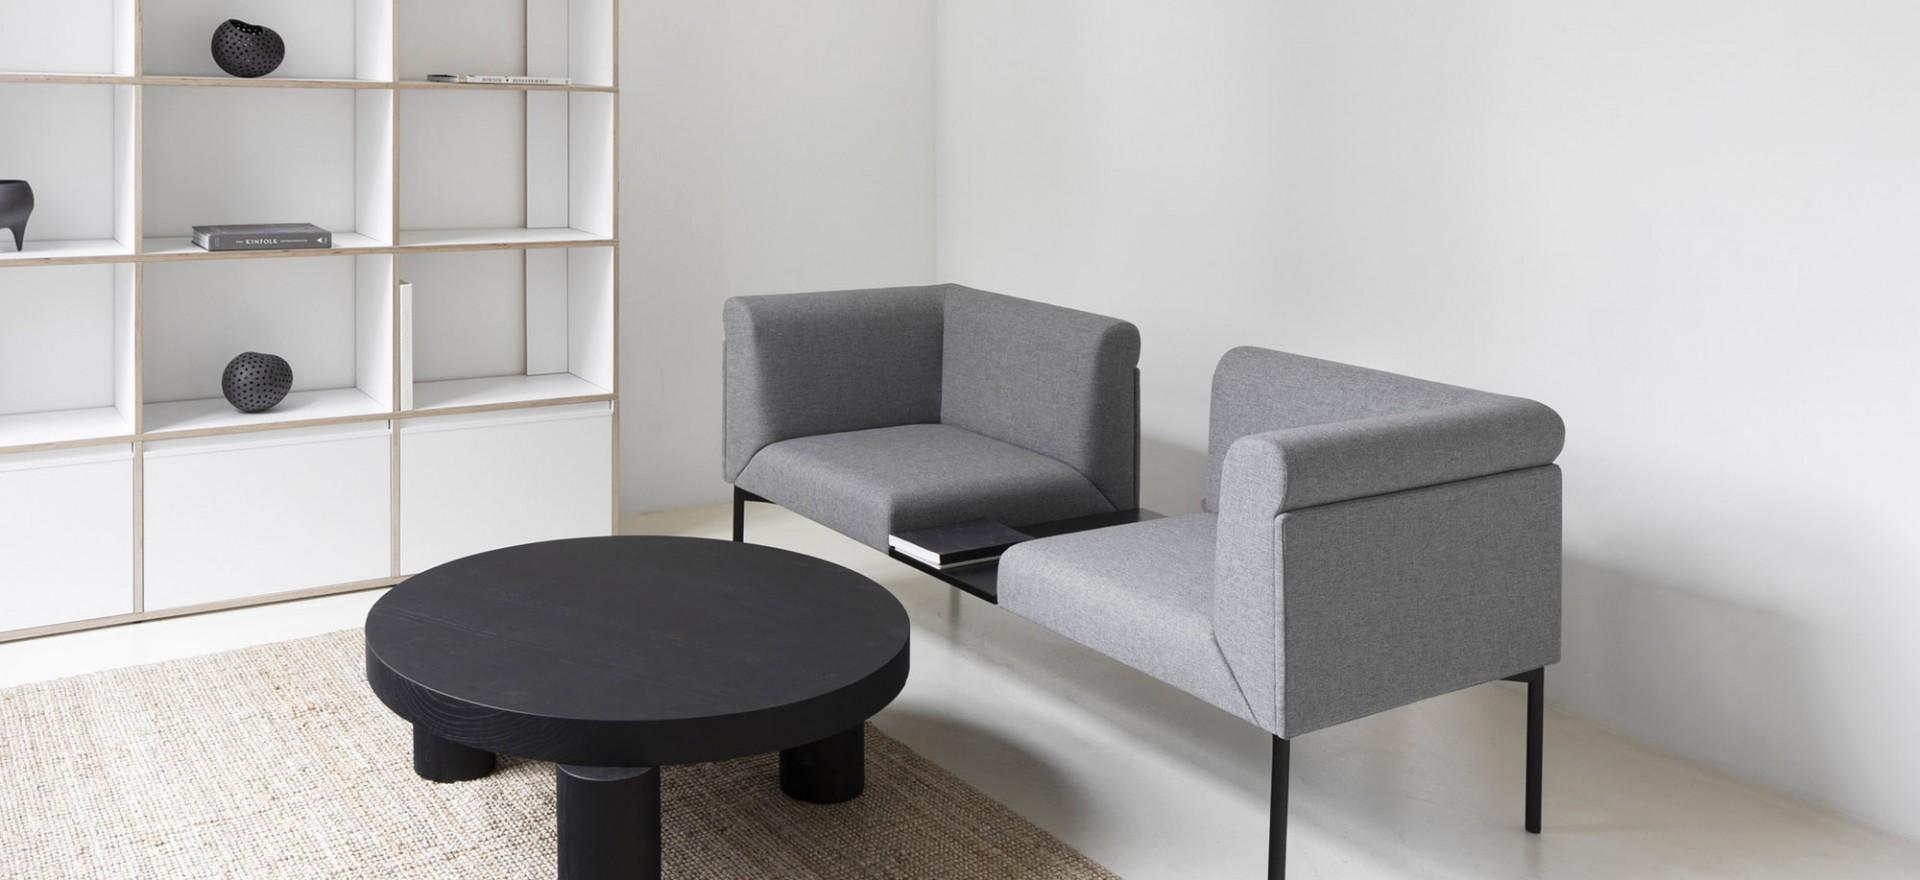 thisispaper_aplace_apartment_interior_design_warsaw_berlin_maja_wirkus_photography_3 copy 1